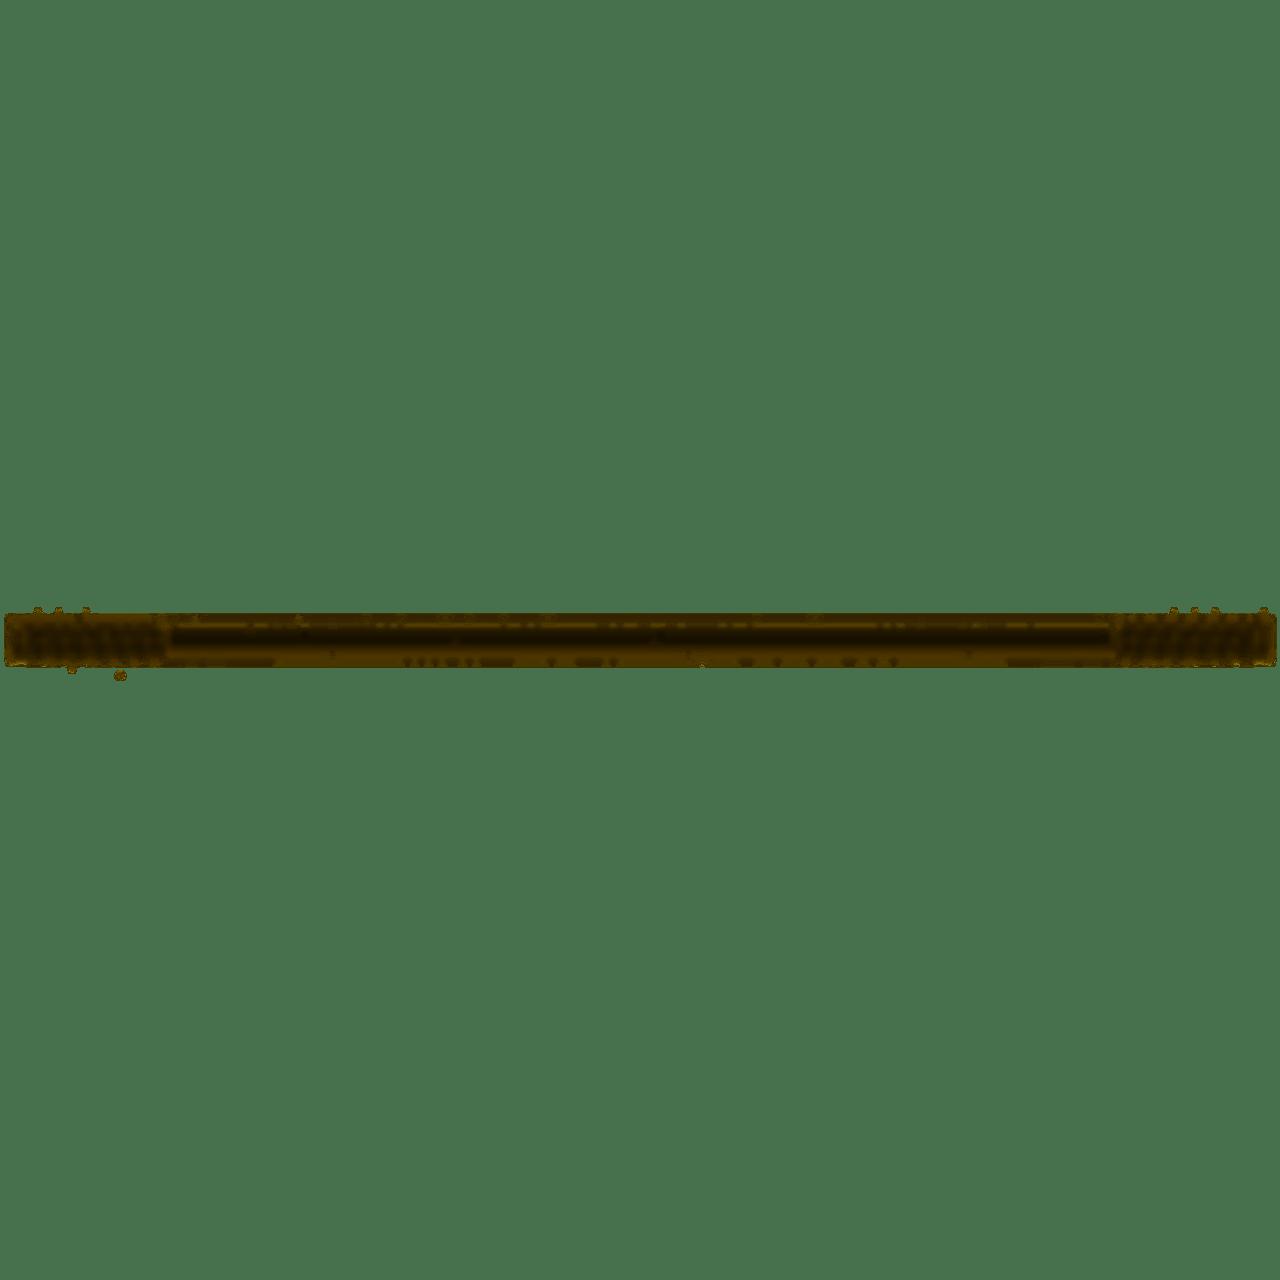 "Kerick Float Rod 3"" Stainless"